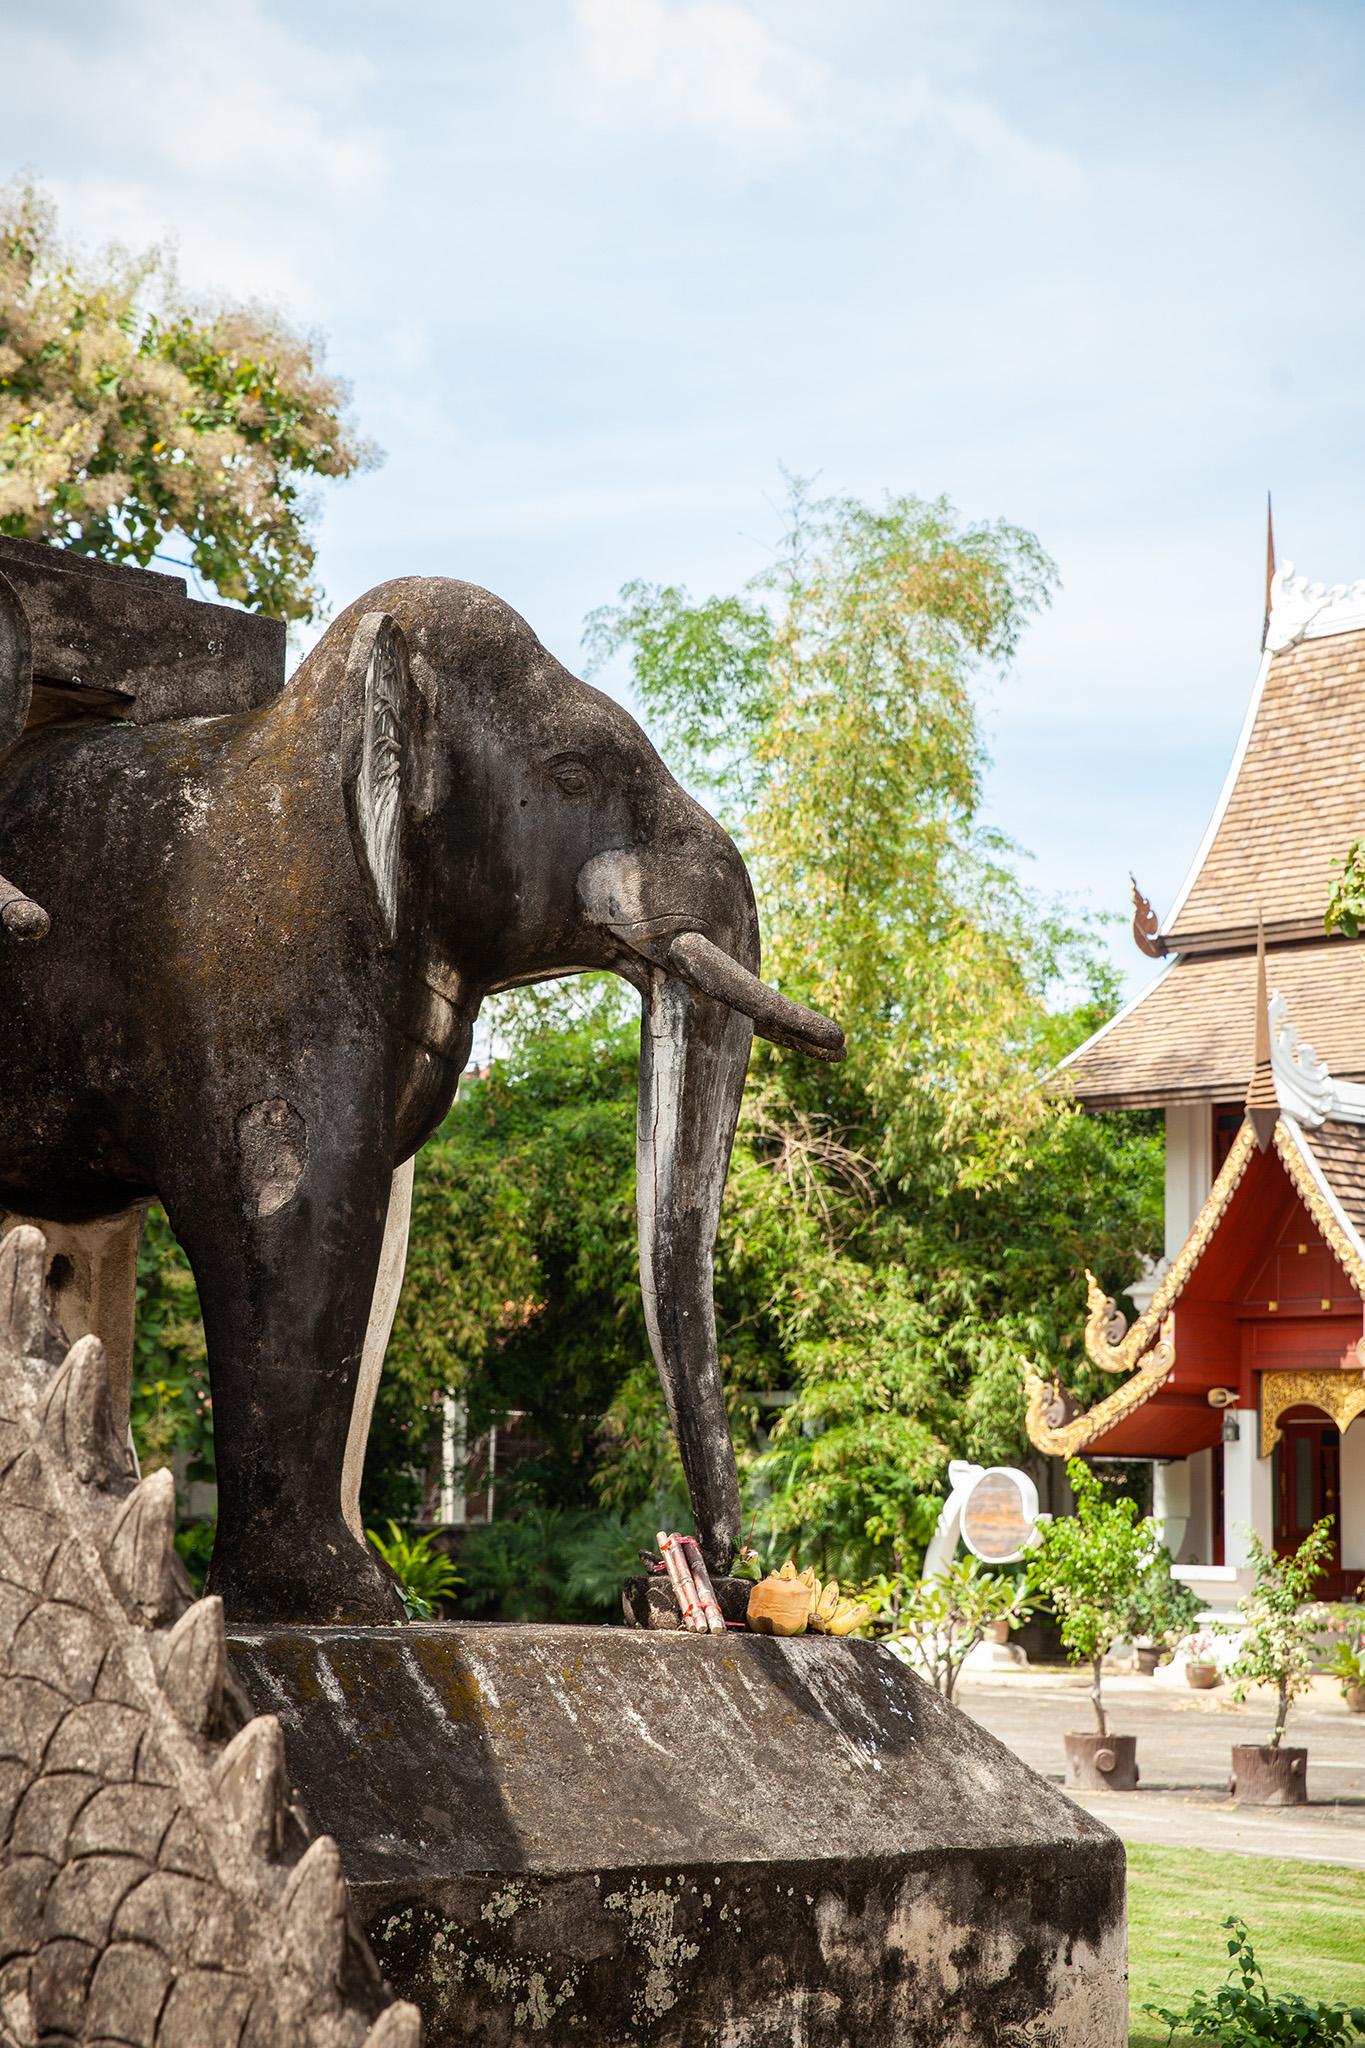 Detail of the elephants at Wat Chiang Man